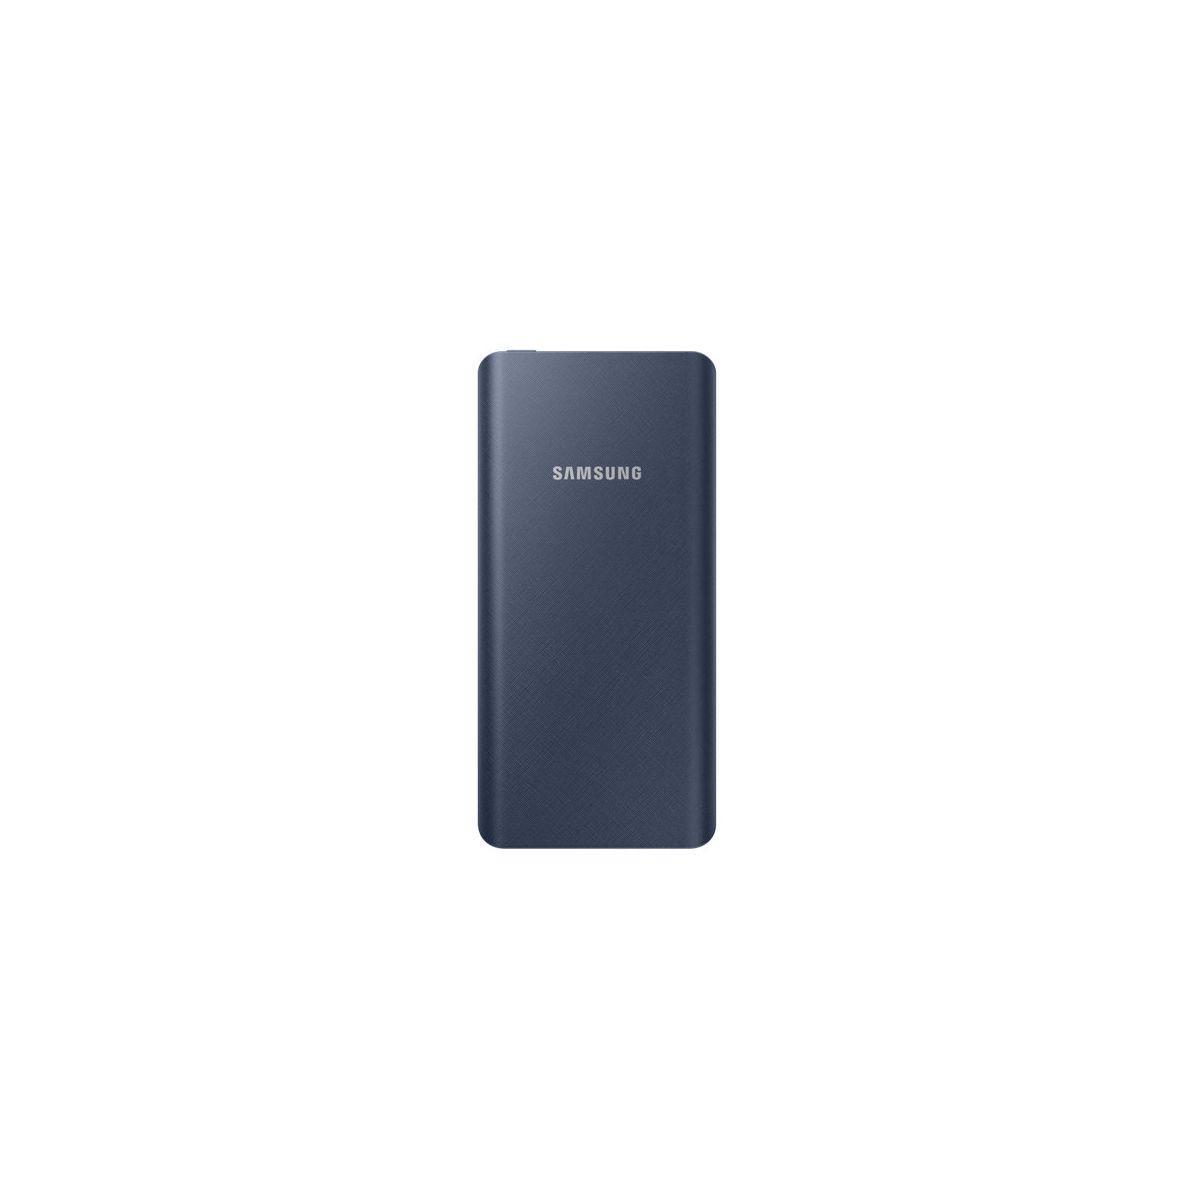 Batterie externe samsung 10000 mah - bleu - livraison offerte : code premium (photo)